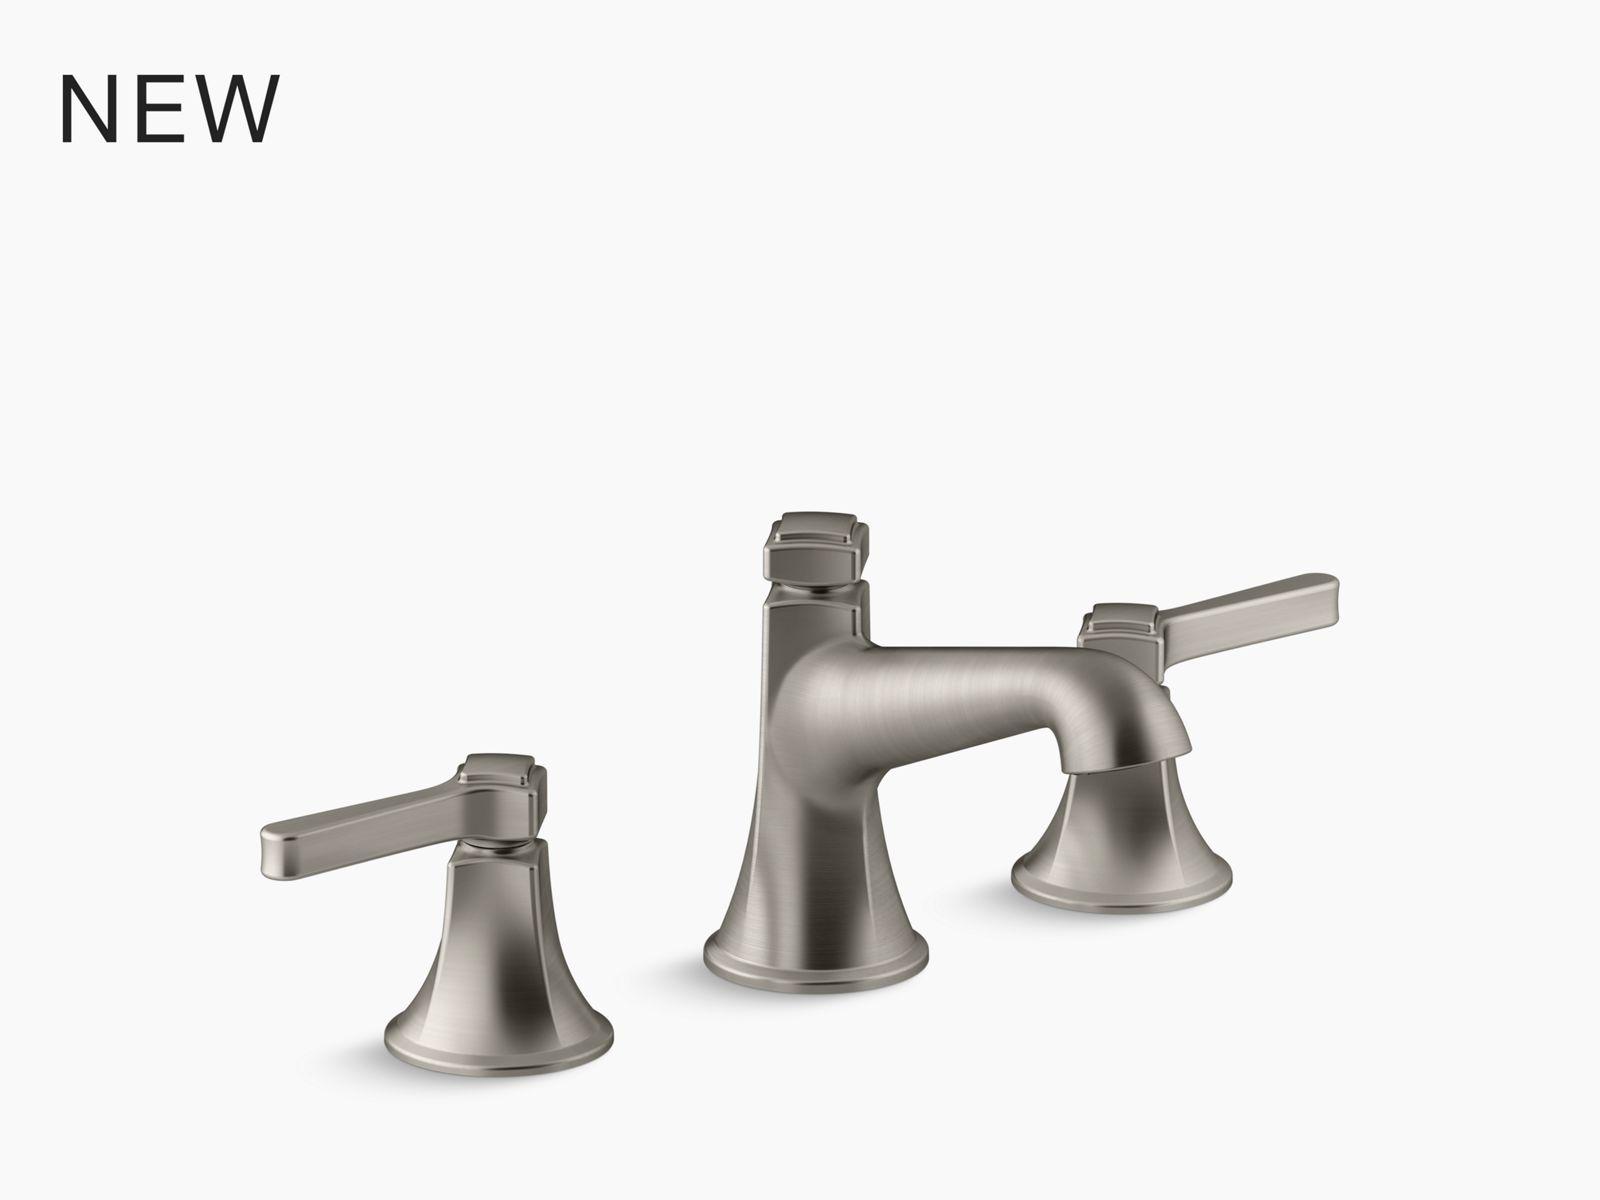 Bath And Shower Products 6032 Bathcove 59 3 4 X 32 1 4 Bath Shower With Right Hand Drain Bath And Shower Products Shower Bath Bath